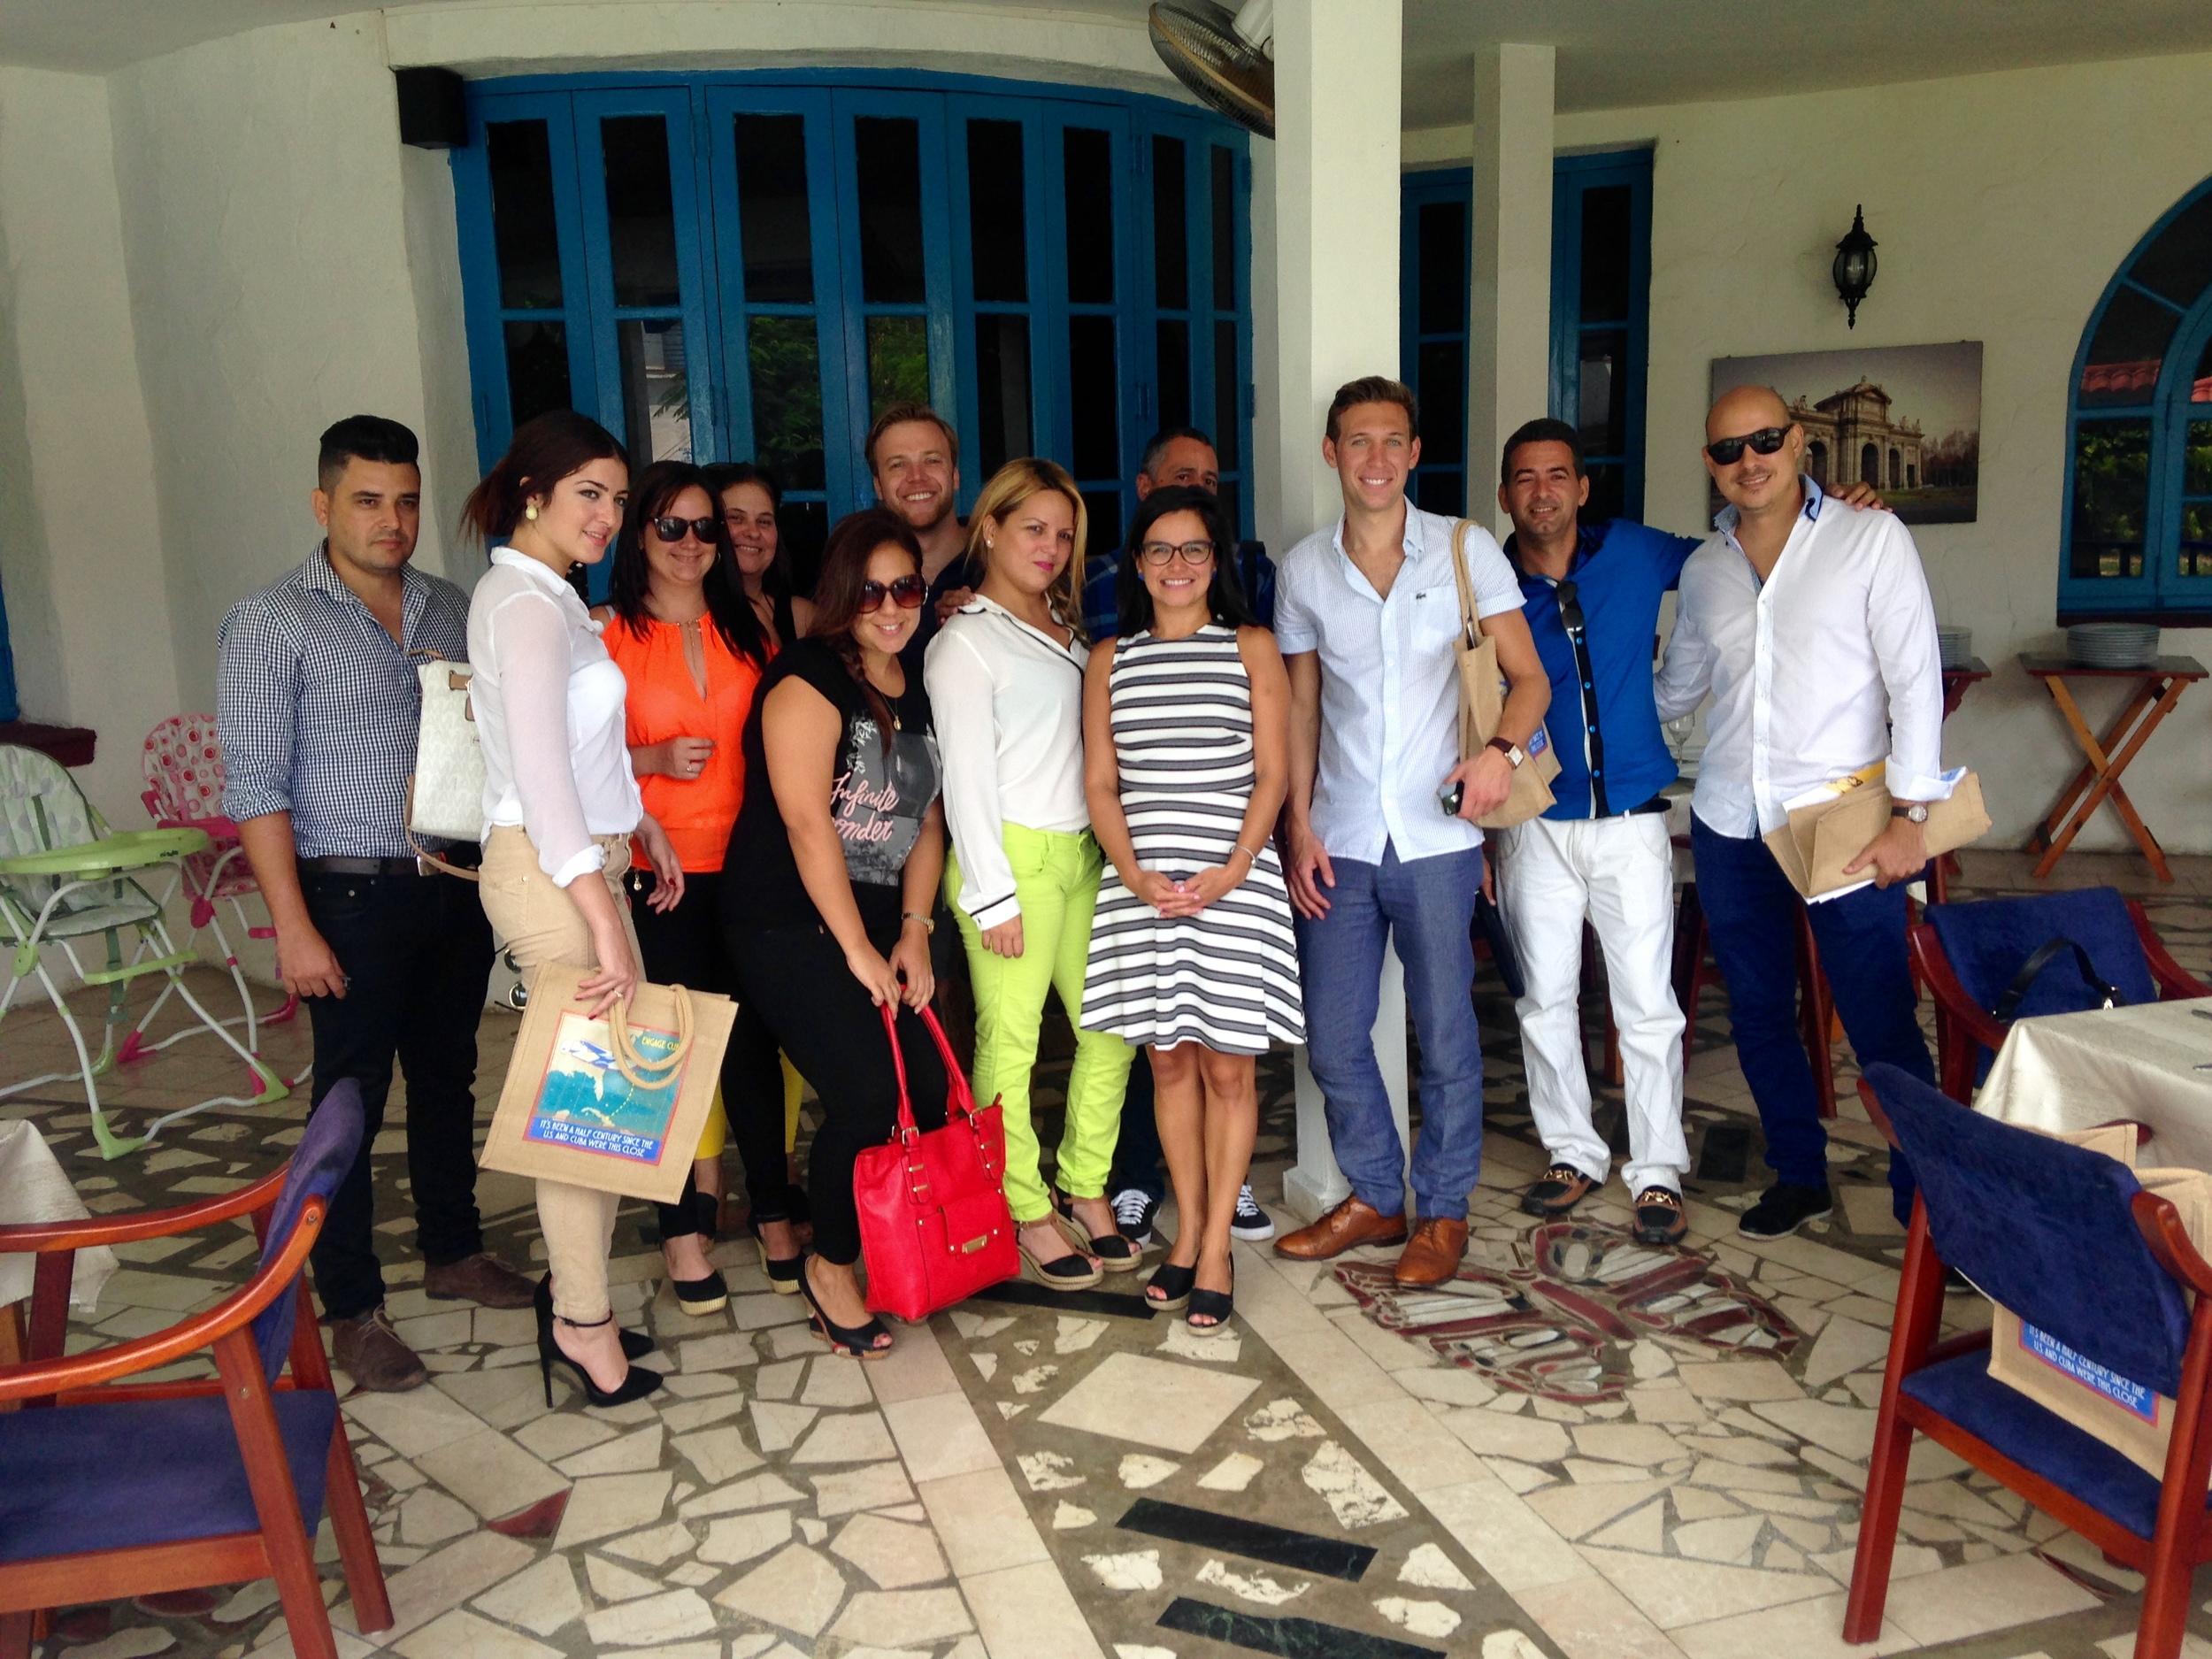 8.15.15 Engage Cuba with Cuban Entrepreneurs